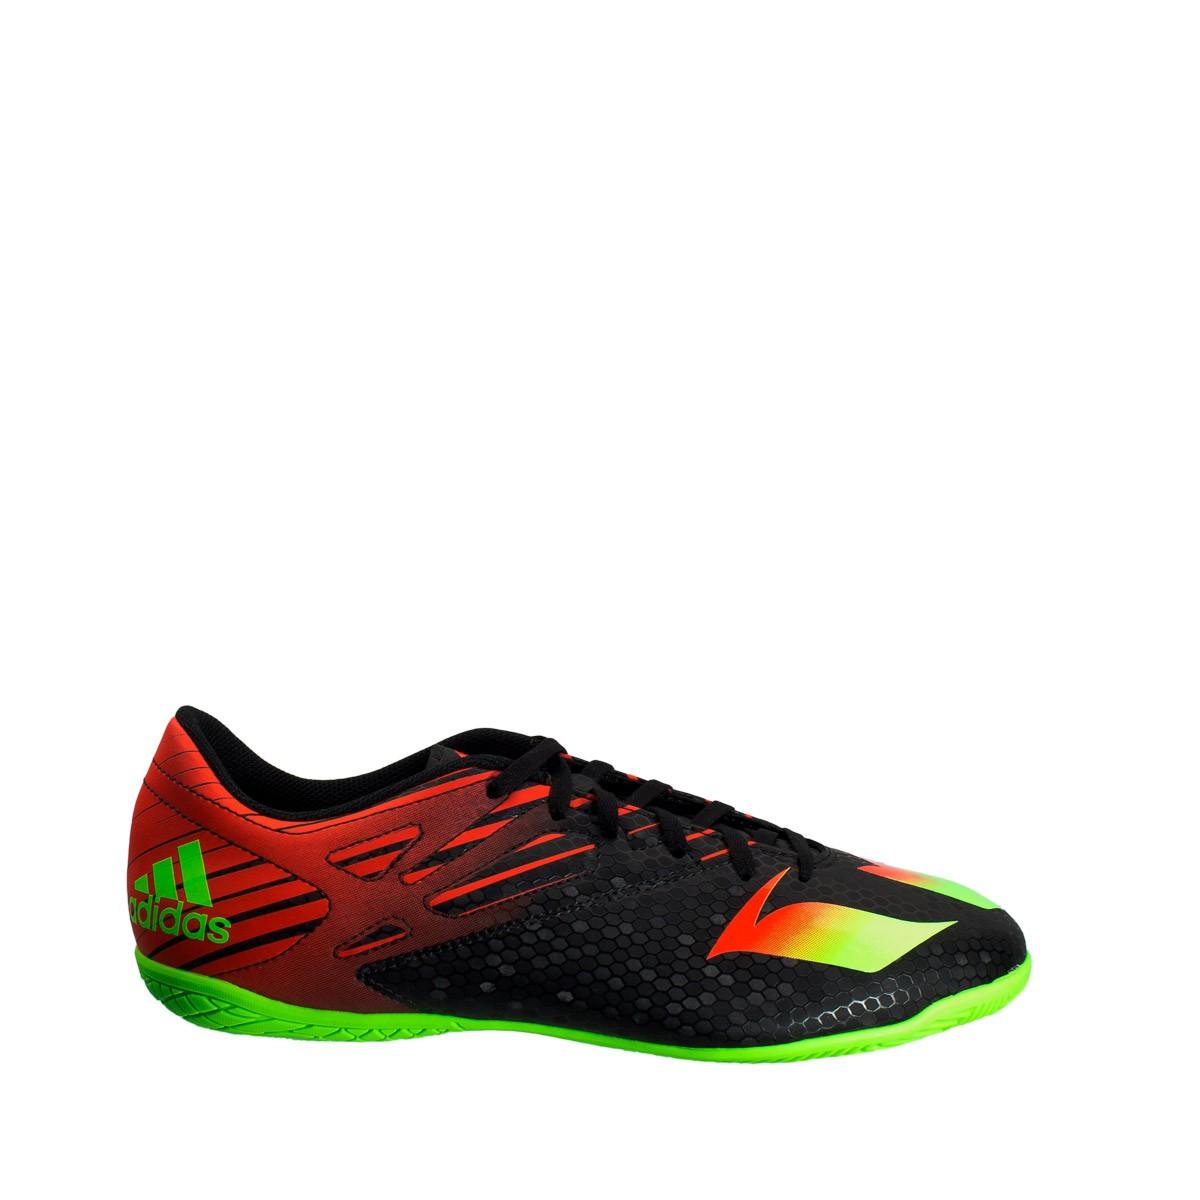 570bb5d432 Chuteira Futebol Adidas Messi 15.4 S81404 - Preto laranja